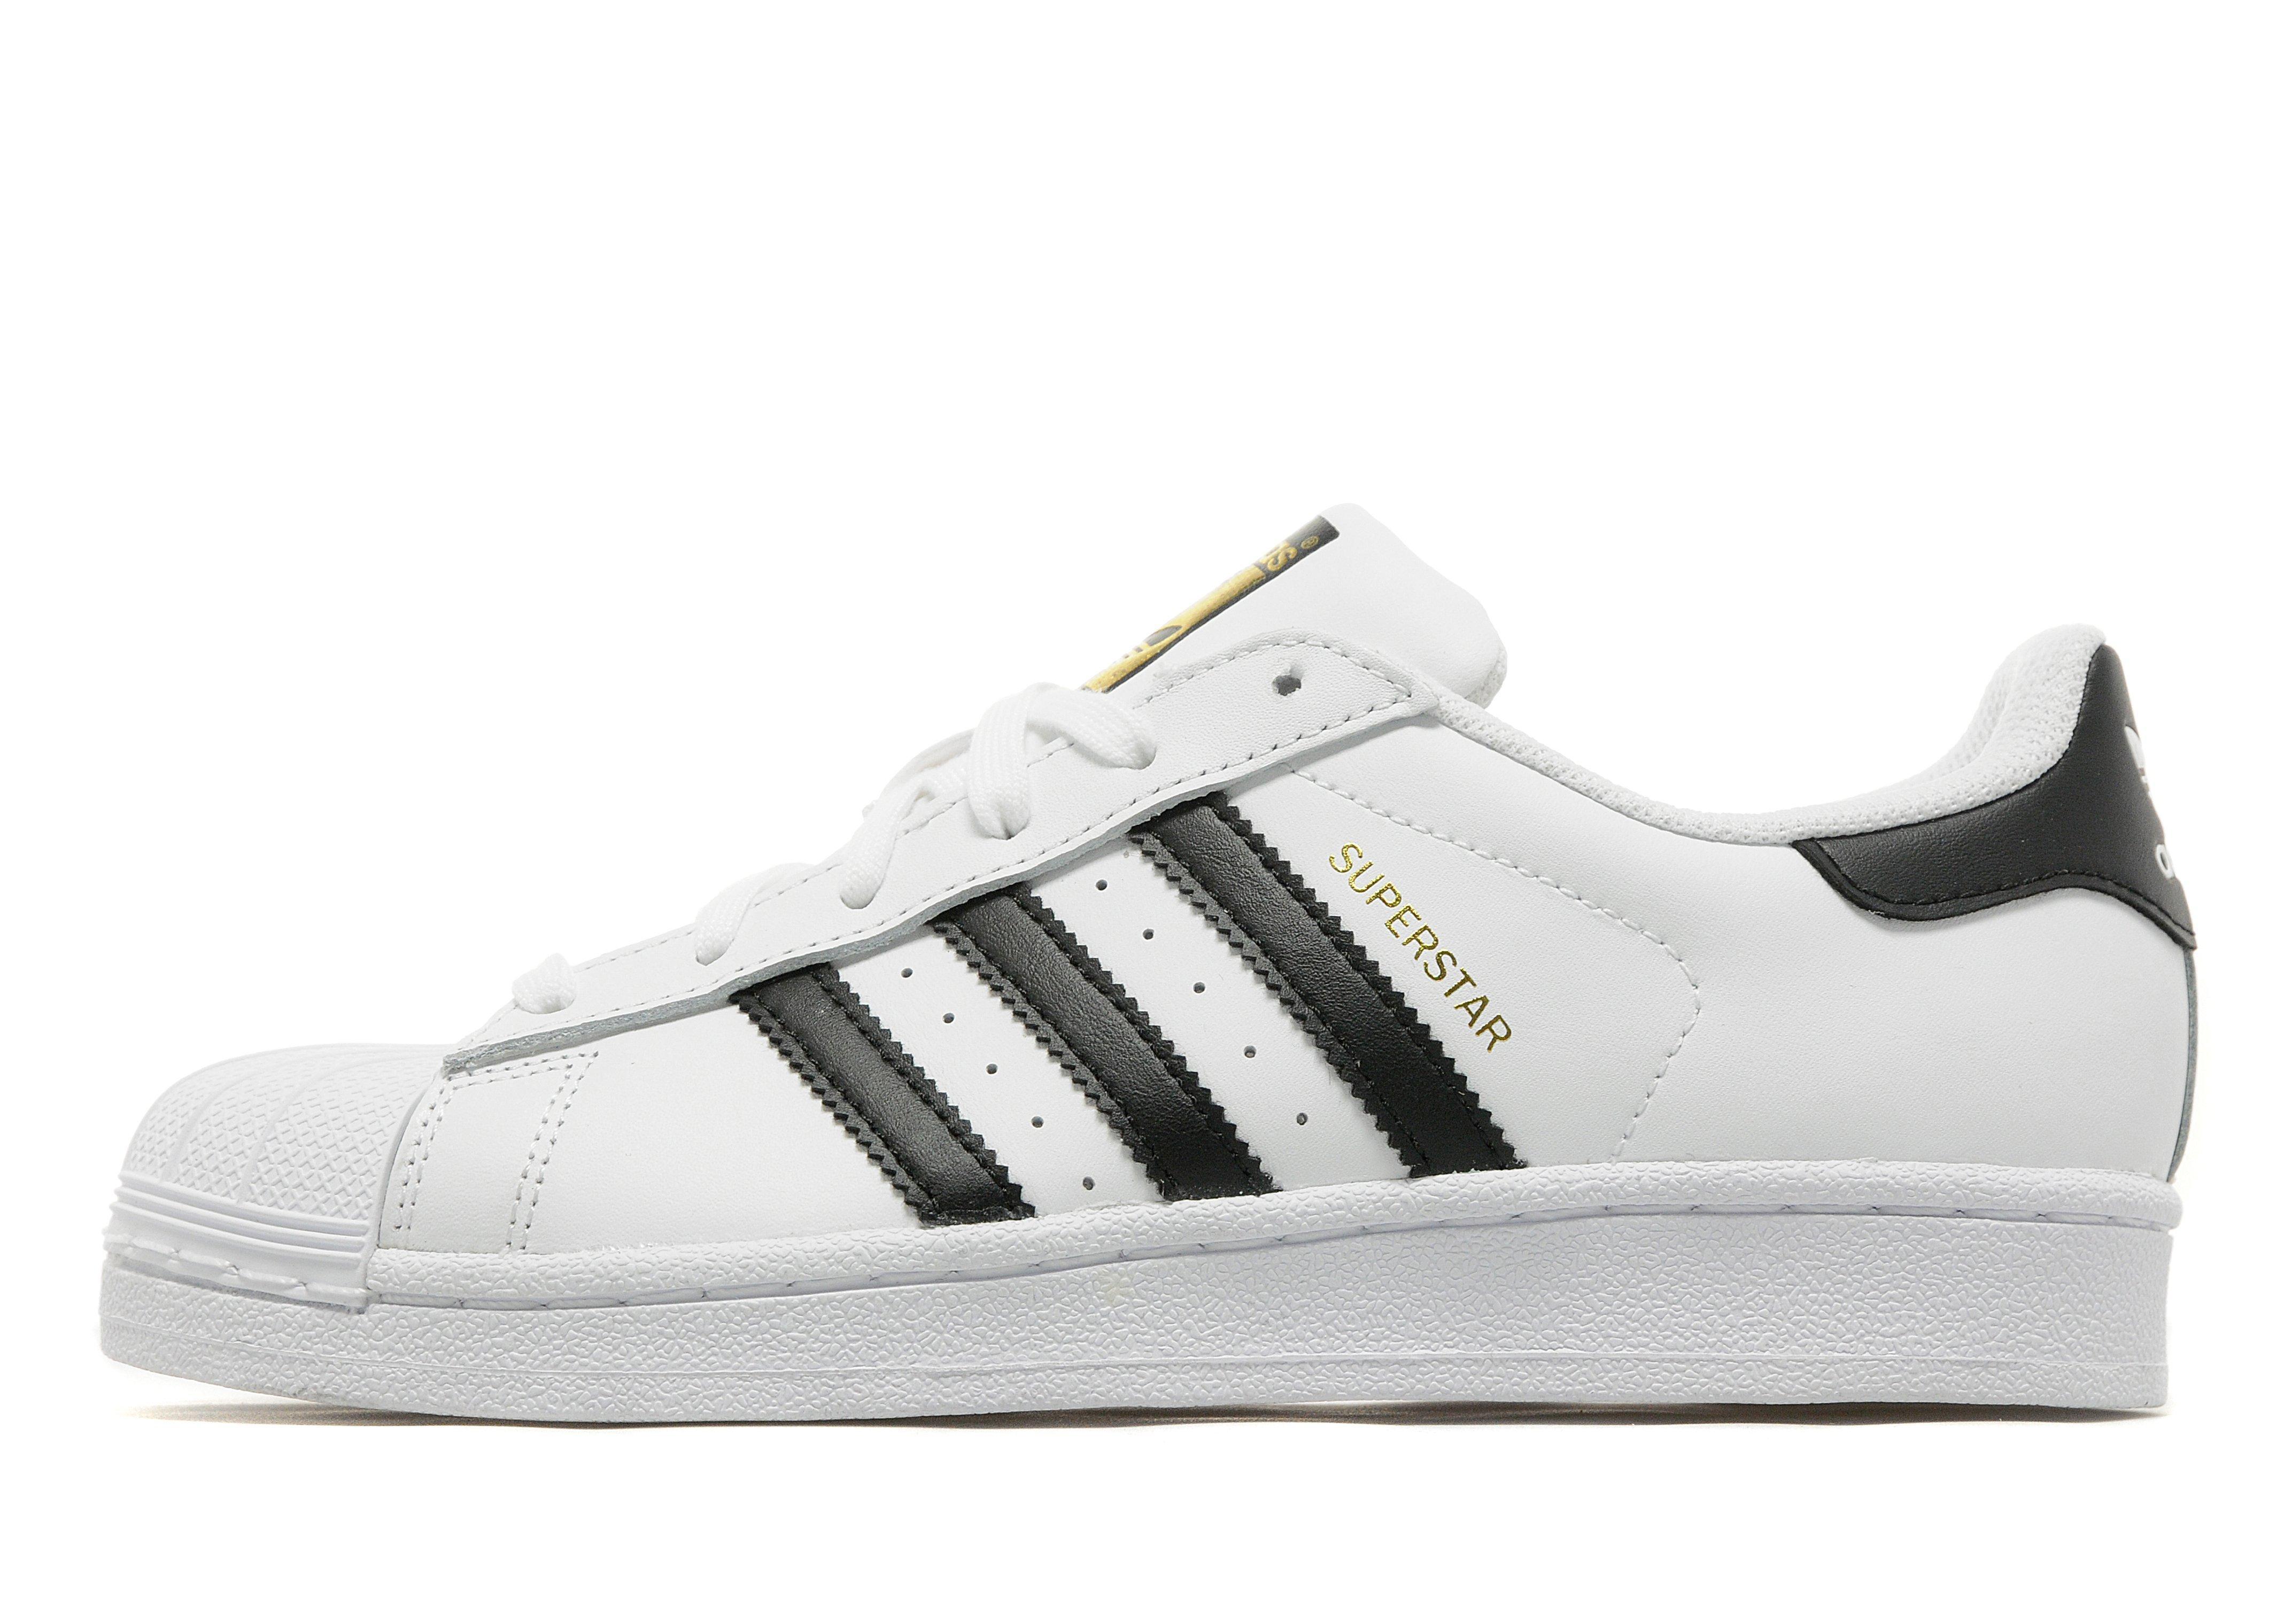 adidas originals classic adidas running shoes new arrival